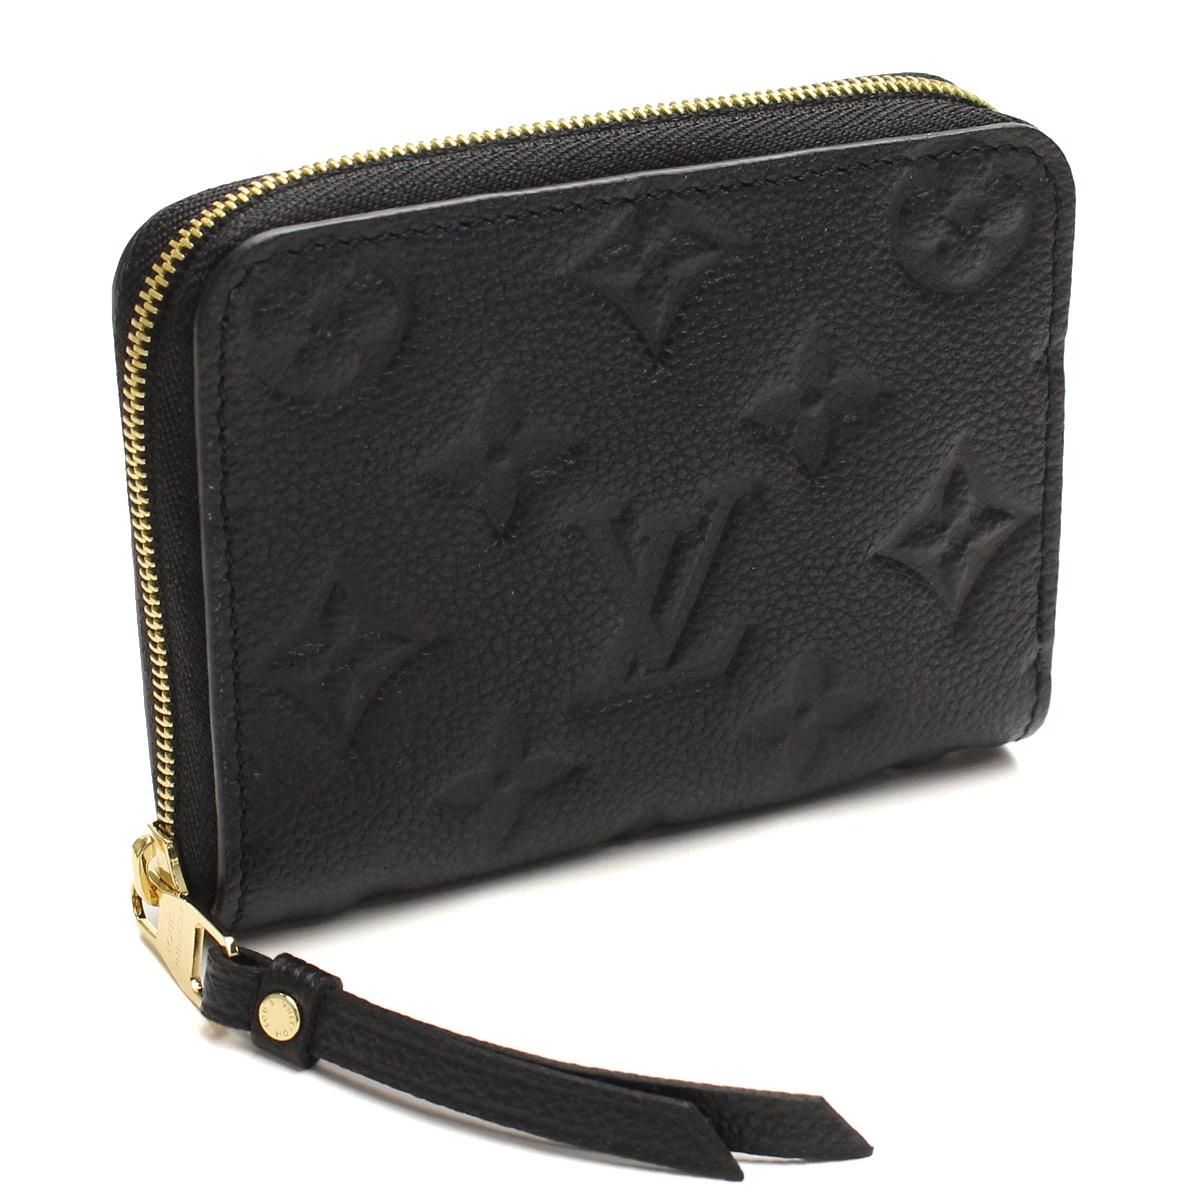 Louis Vuitton (LOUIS VUITTON) and plant zippy coin purse M60574 Noir black(  taxfree send by EMS authentic A brand new item ) b3b50aca271